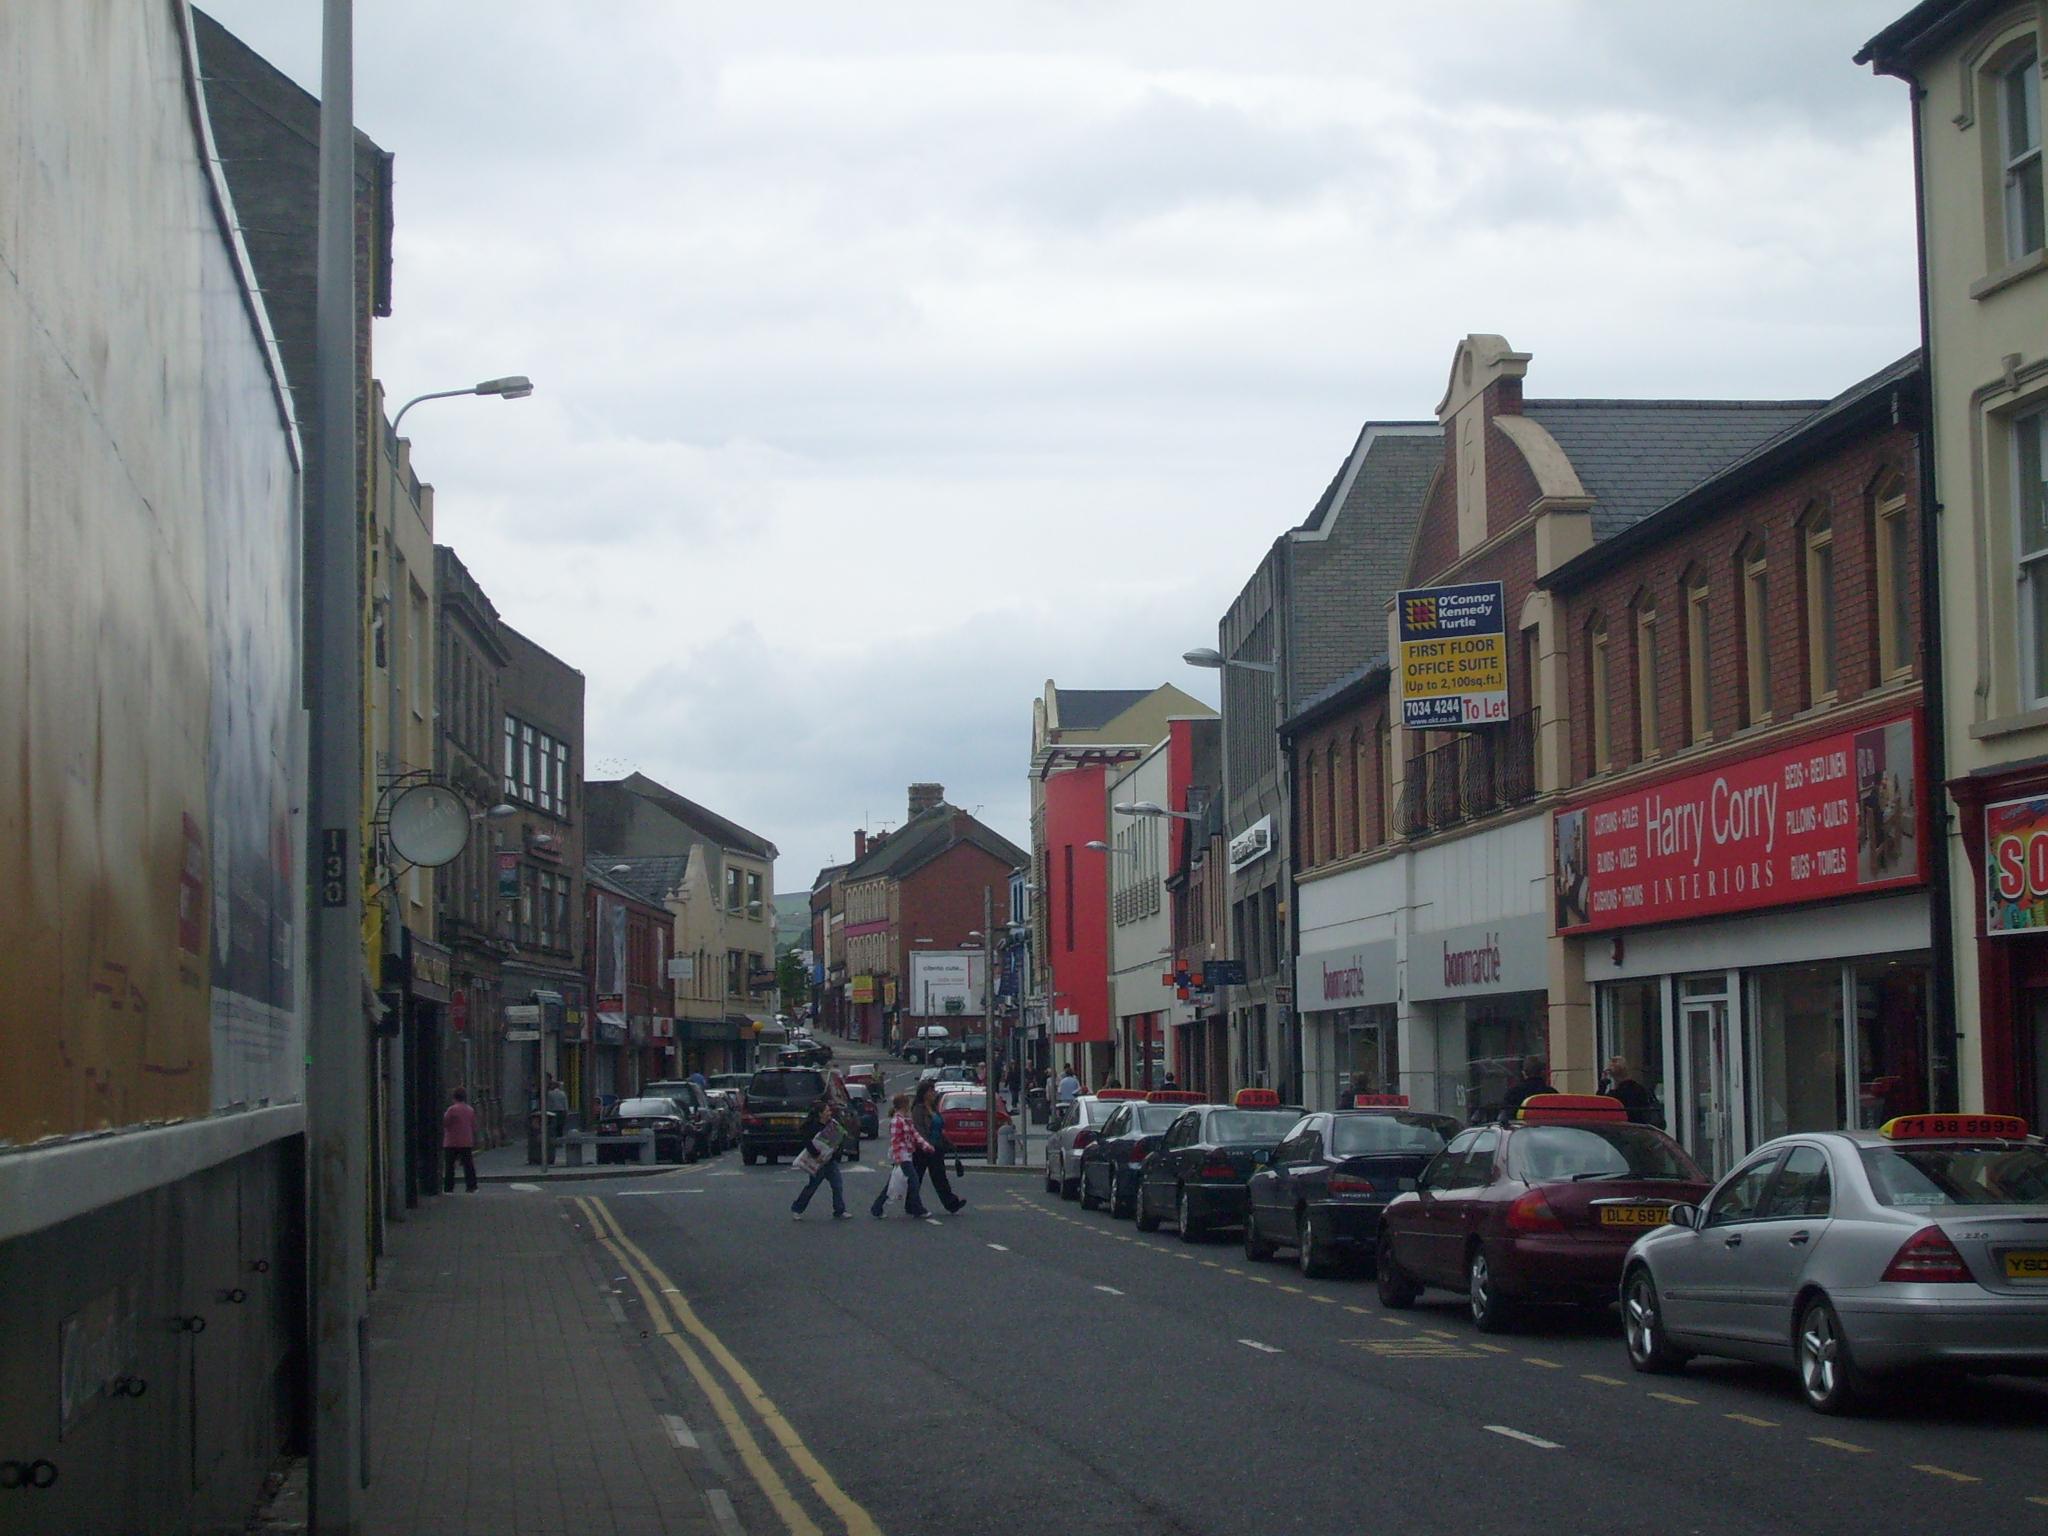 Strabane high street